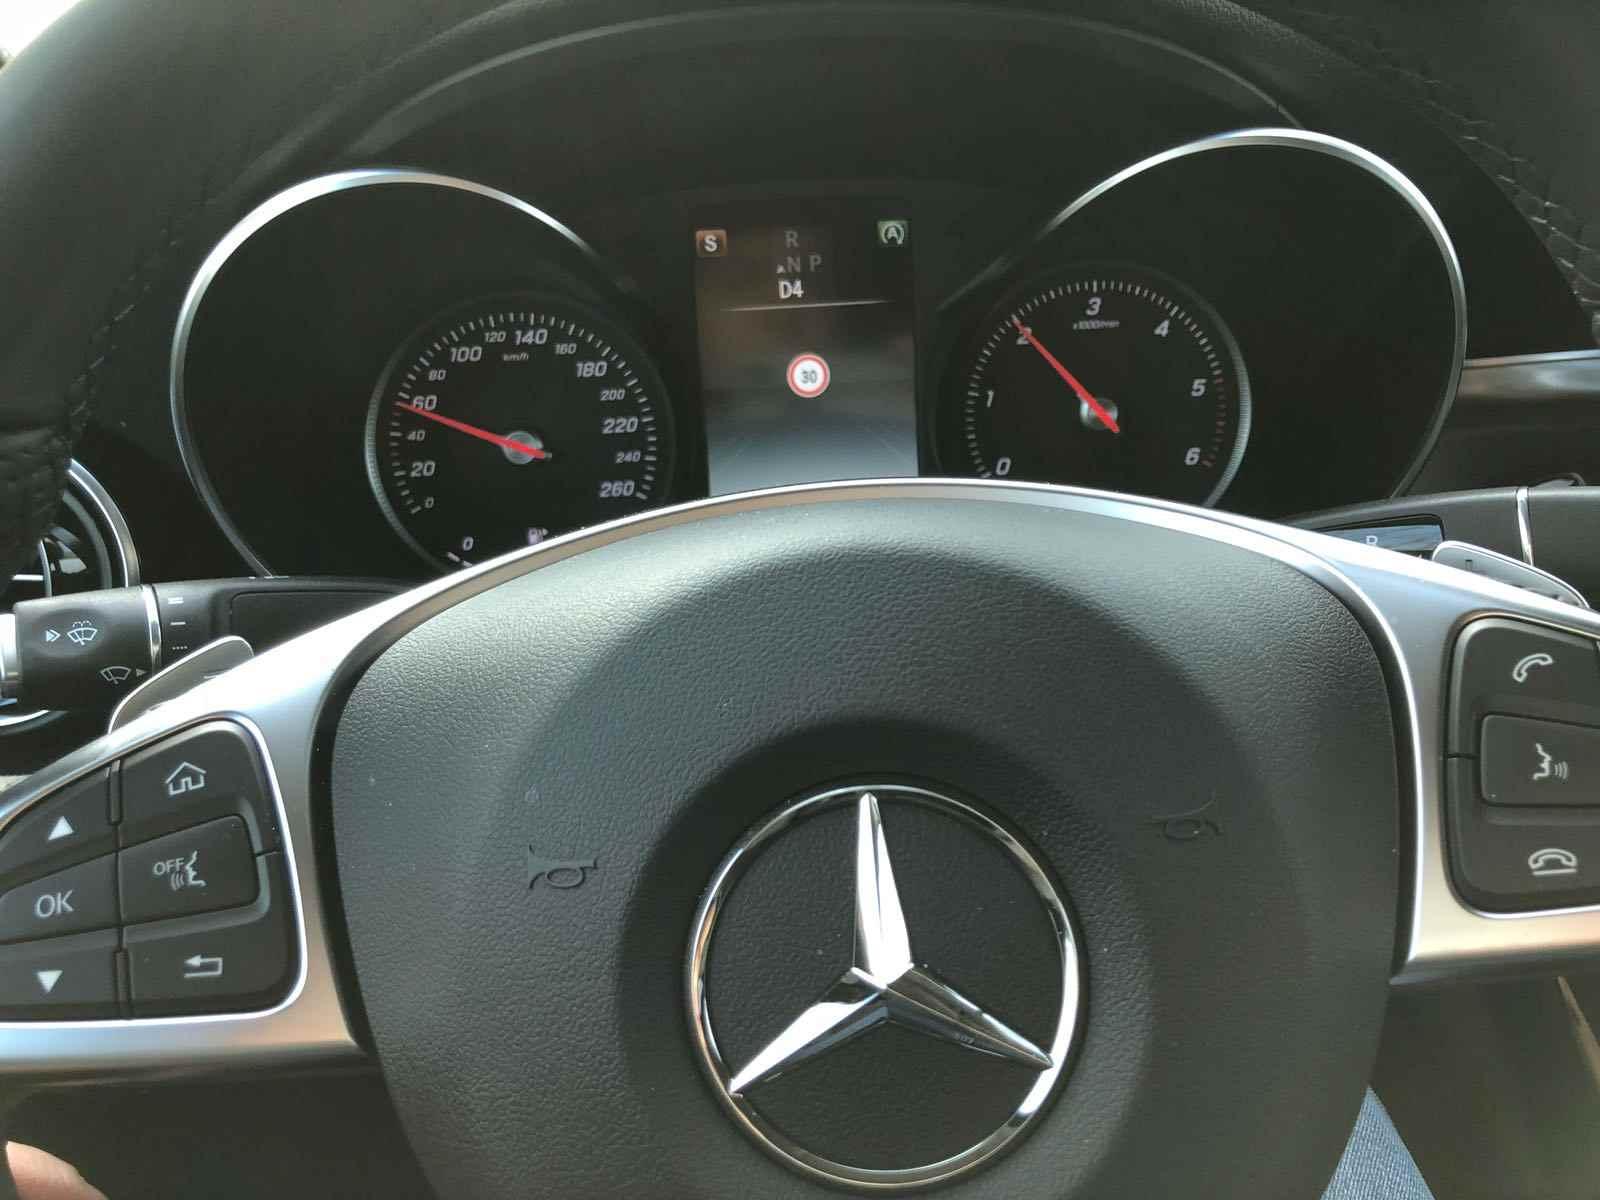 Rimappatura centralina Mercedes GLC 250d